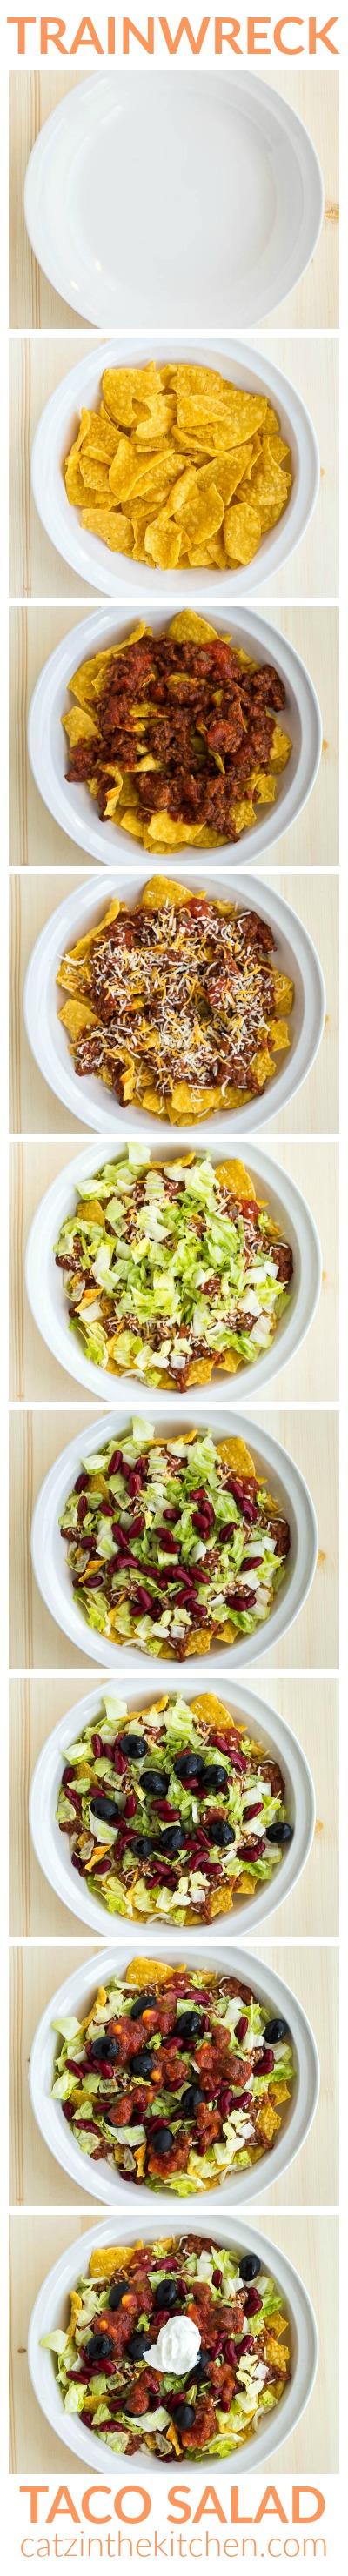 Trainwreck Taco Salad | Catz in the Kitchen | catzinthekitchen.com | #trainwreck #salad #taco #recipe